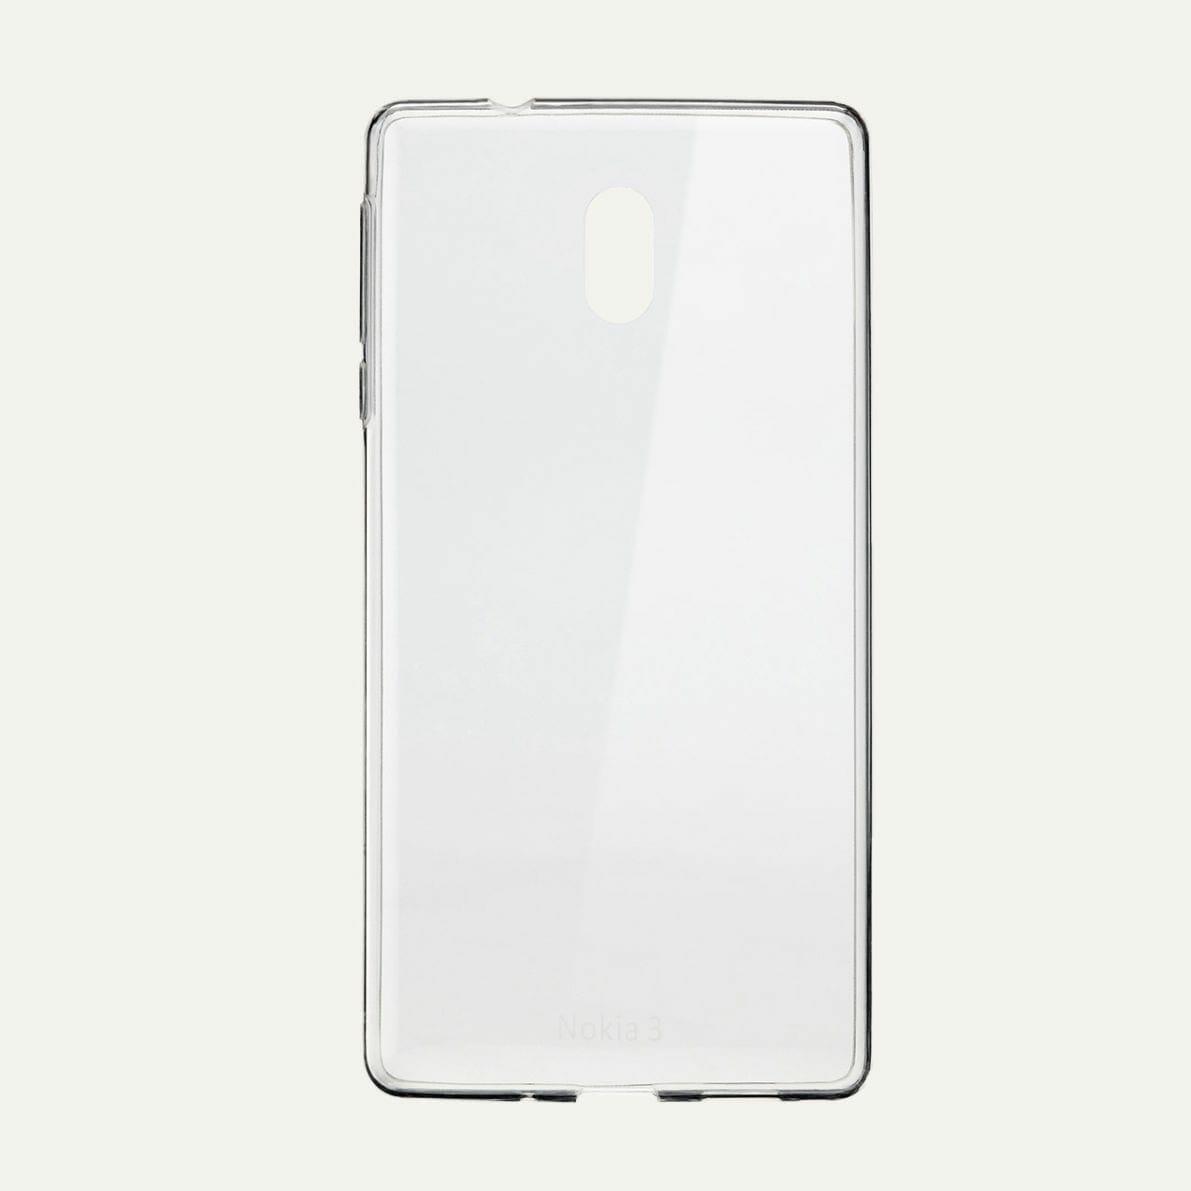 Official Cases For Nokia 6 Nokia 7 Plus And Nokia 8